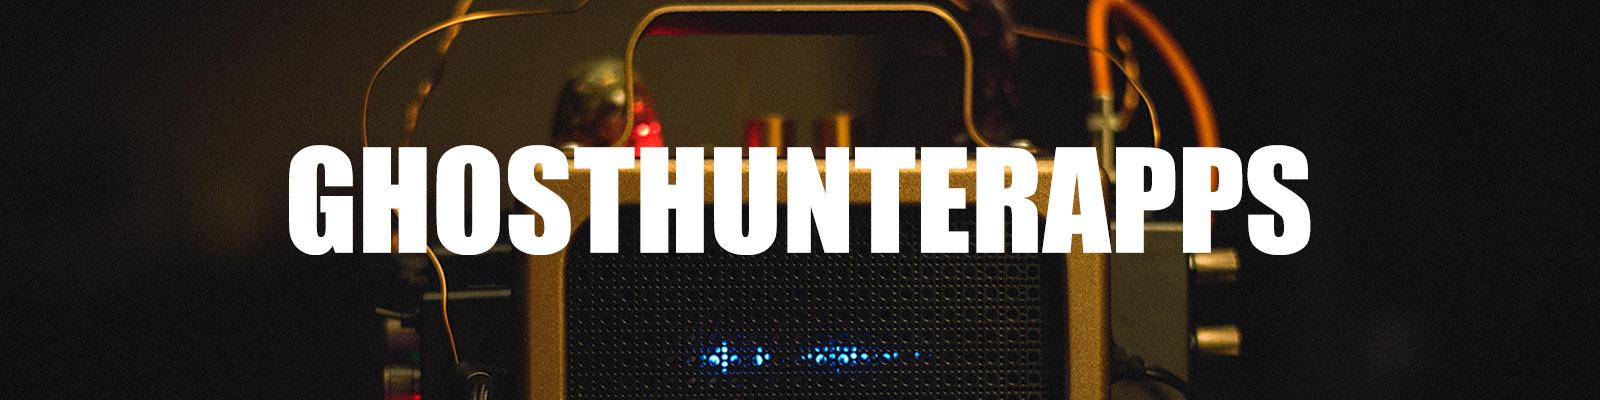 Ghost Hunter Apps - GHOSTHUNTERAPPS com